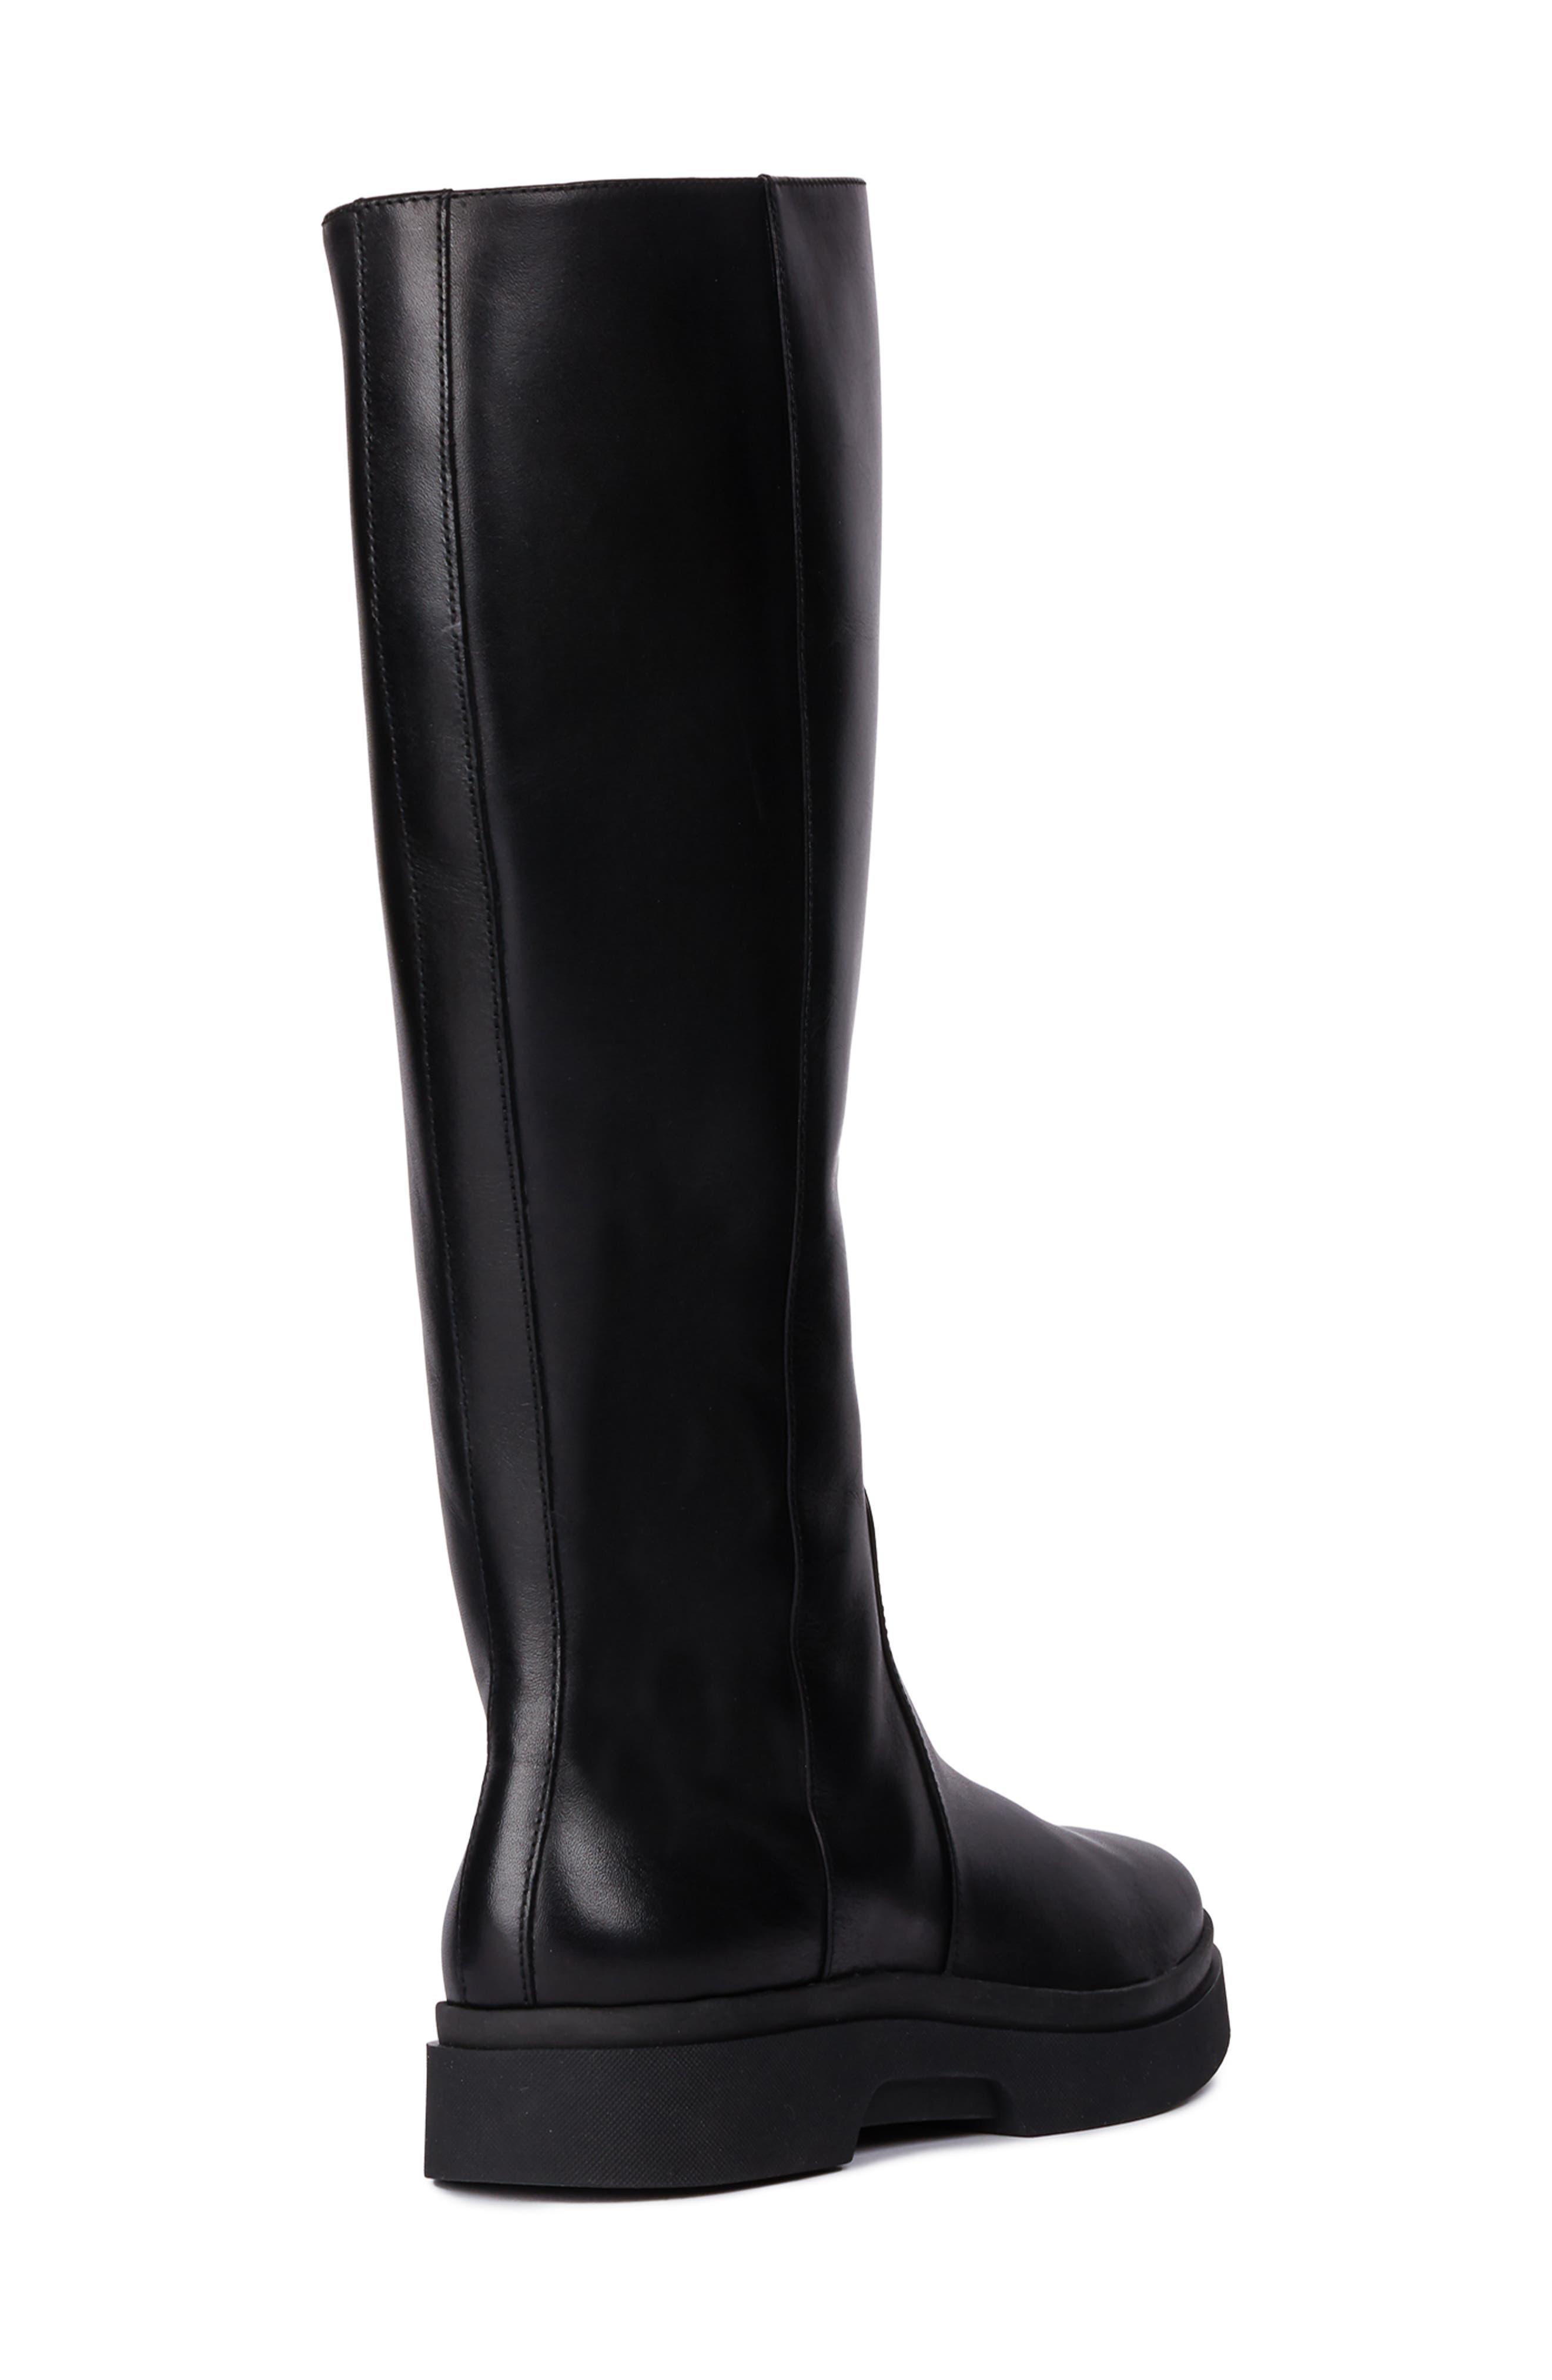 Myluse Knee High Platform Waterproof Boot,                             Alternate thumbnail 2, color,                             BLACK LEATHER